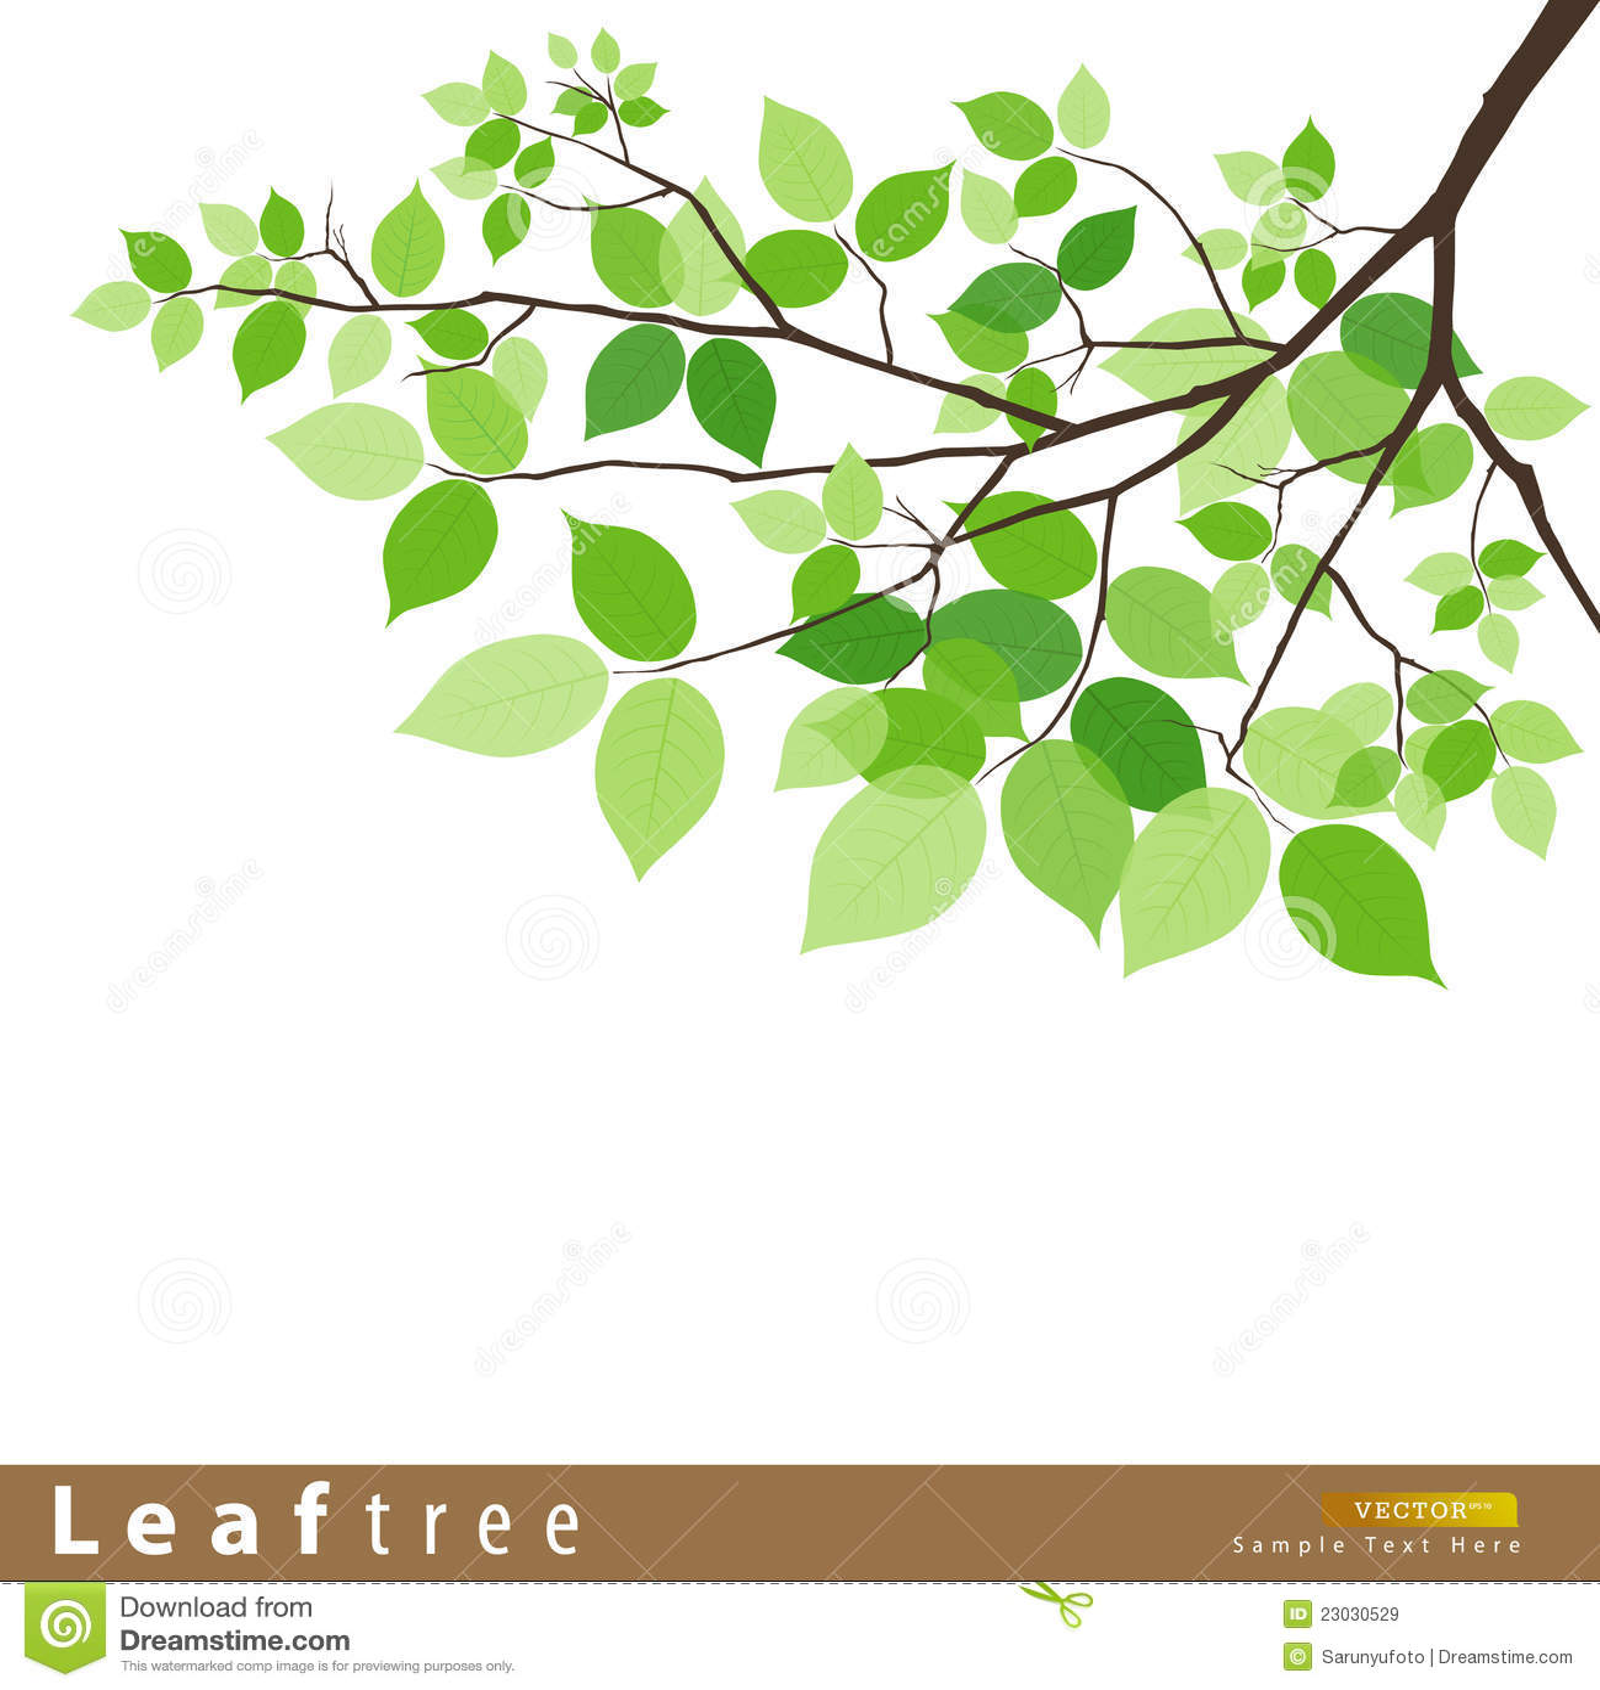 leaf green tree vector illustration stock vector palm tree vector free download palm tree vector free download